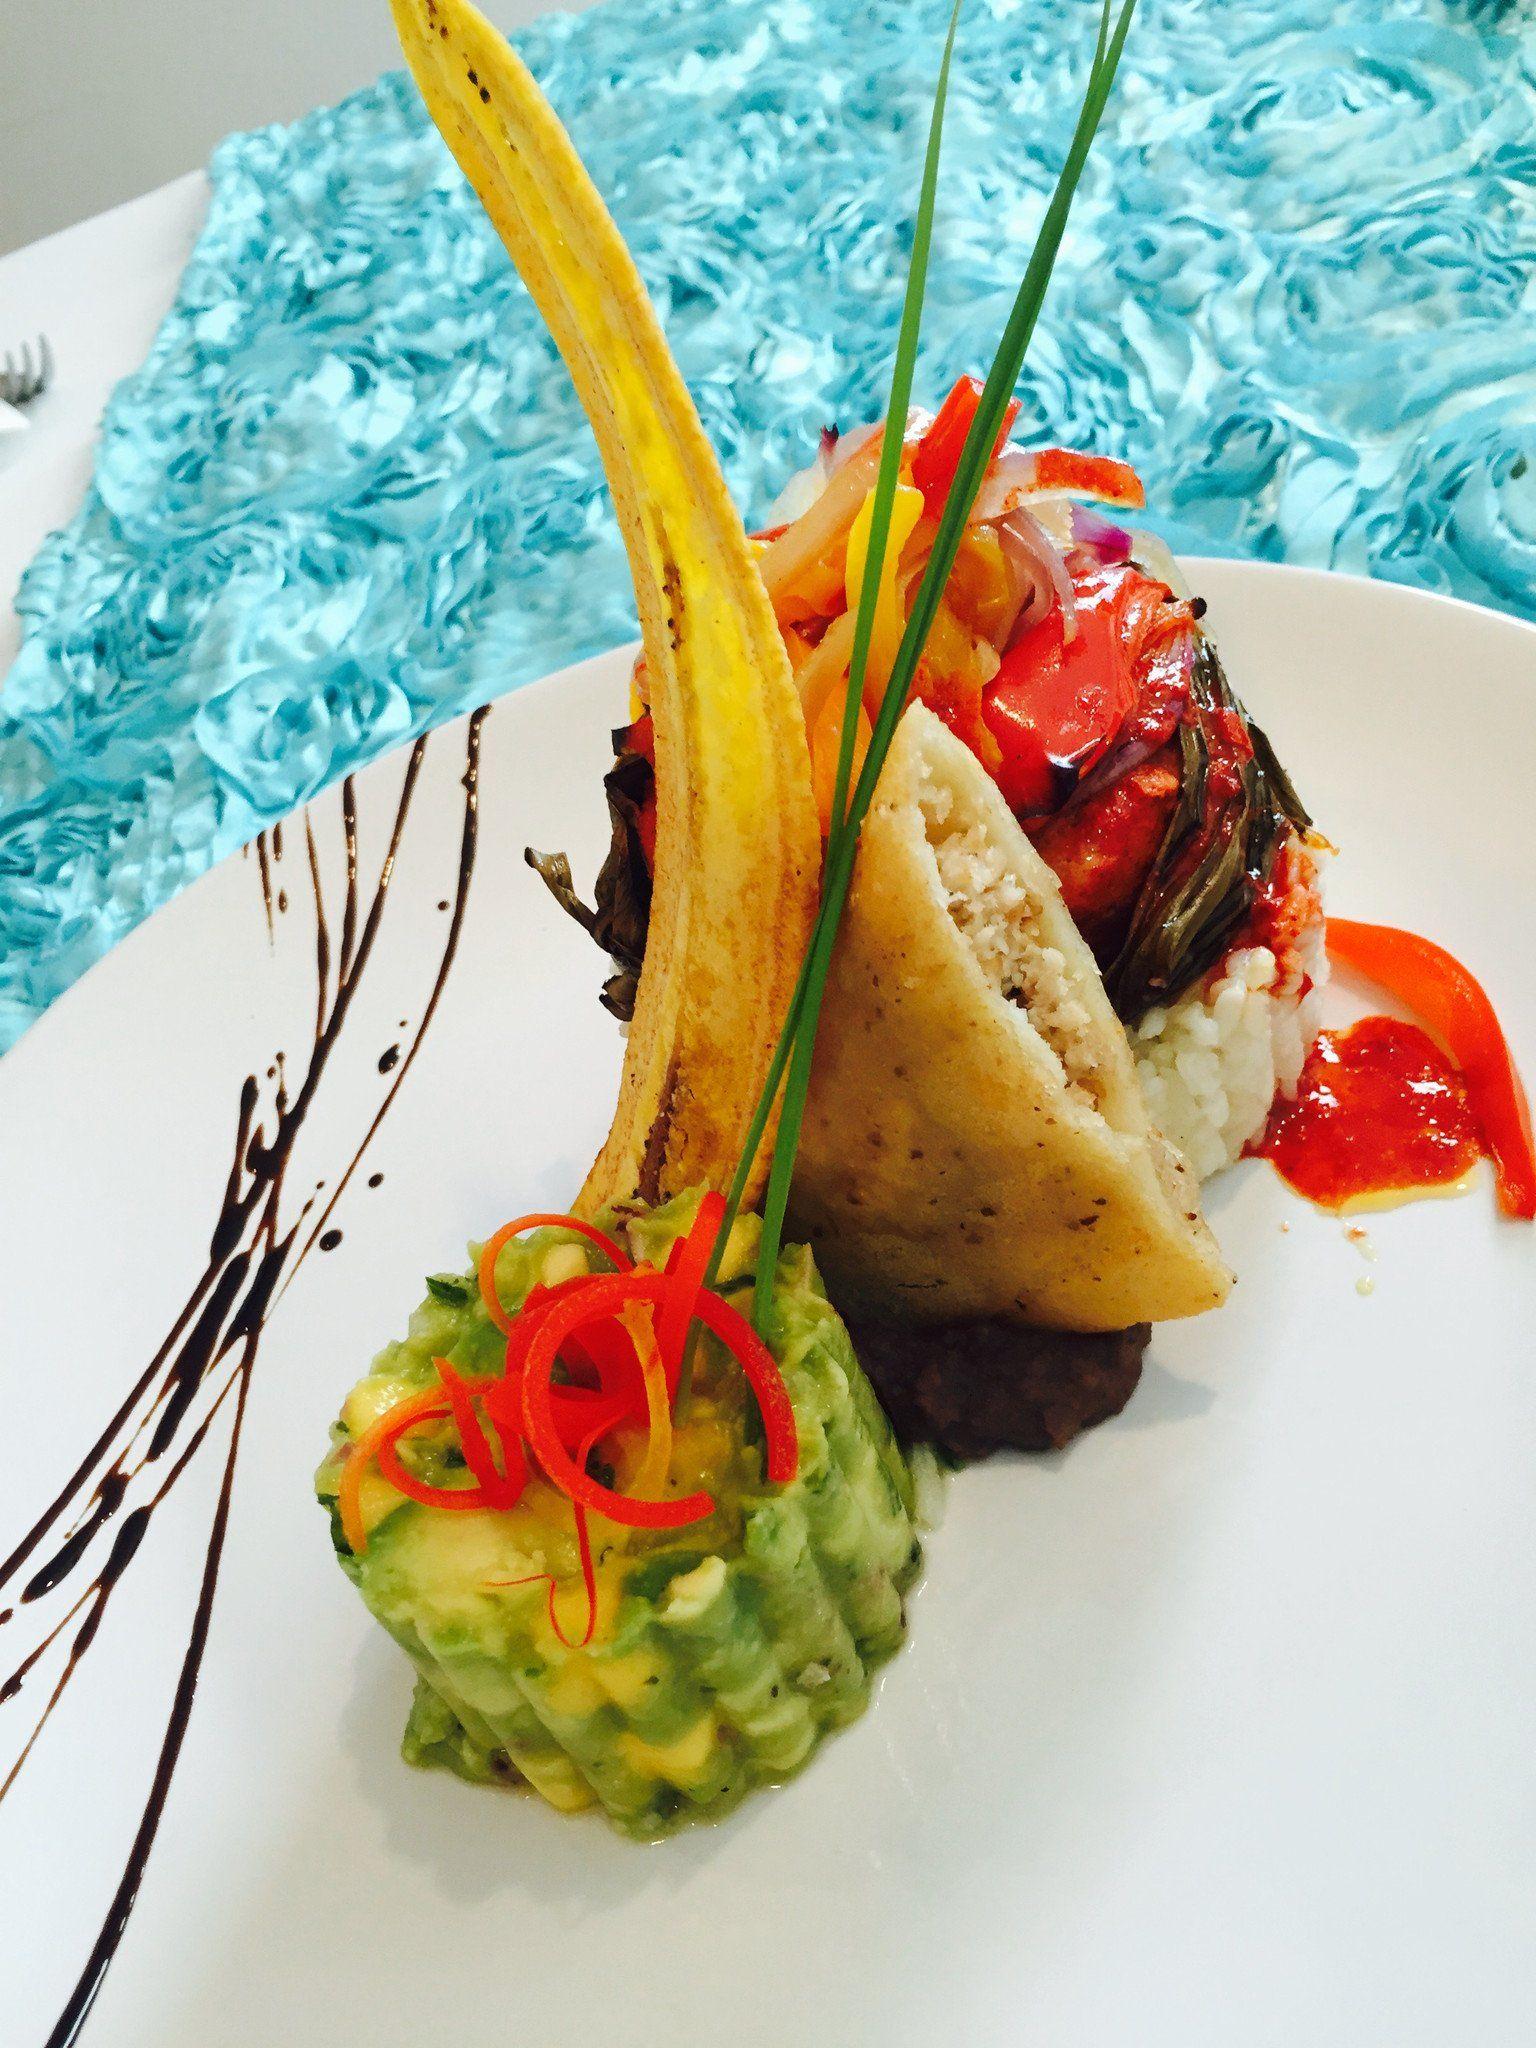 Platos fuertes mexicano fusion gourmet mejores for Comida vanguardia